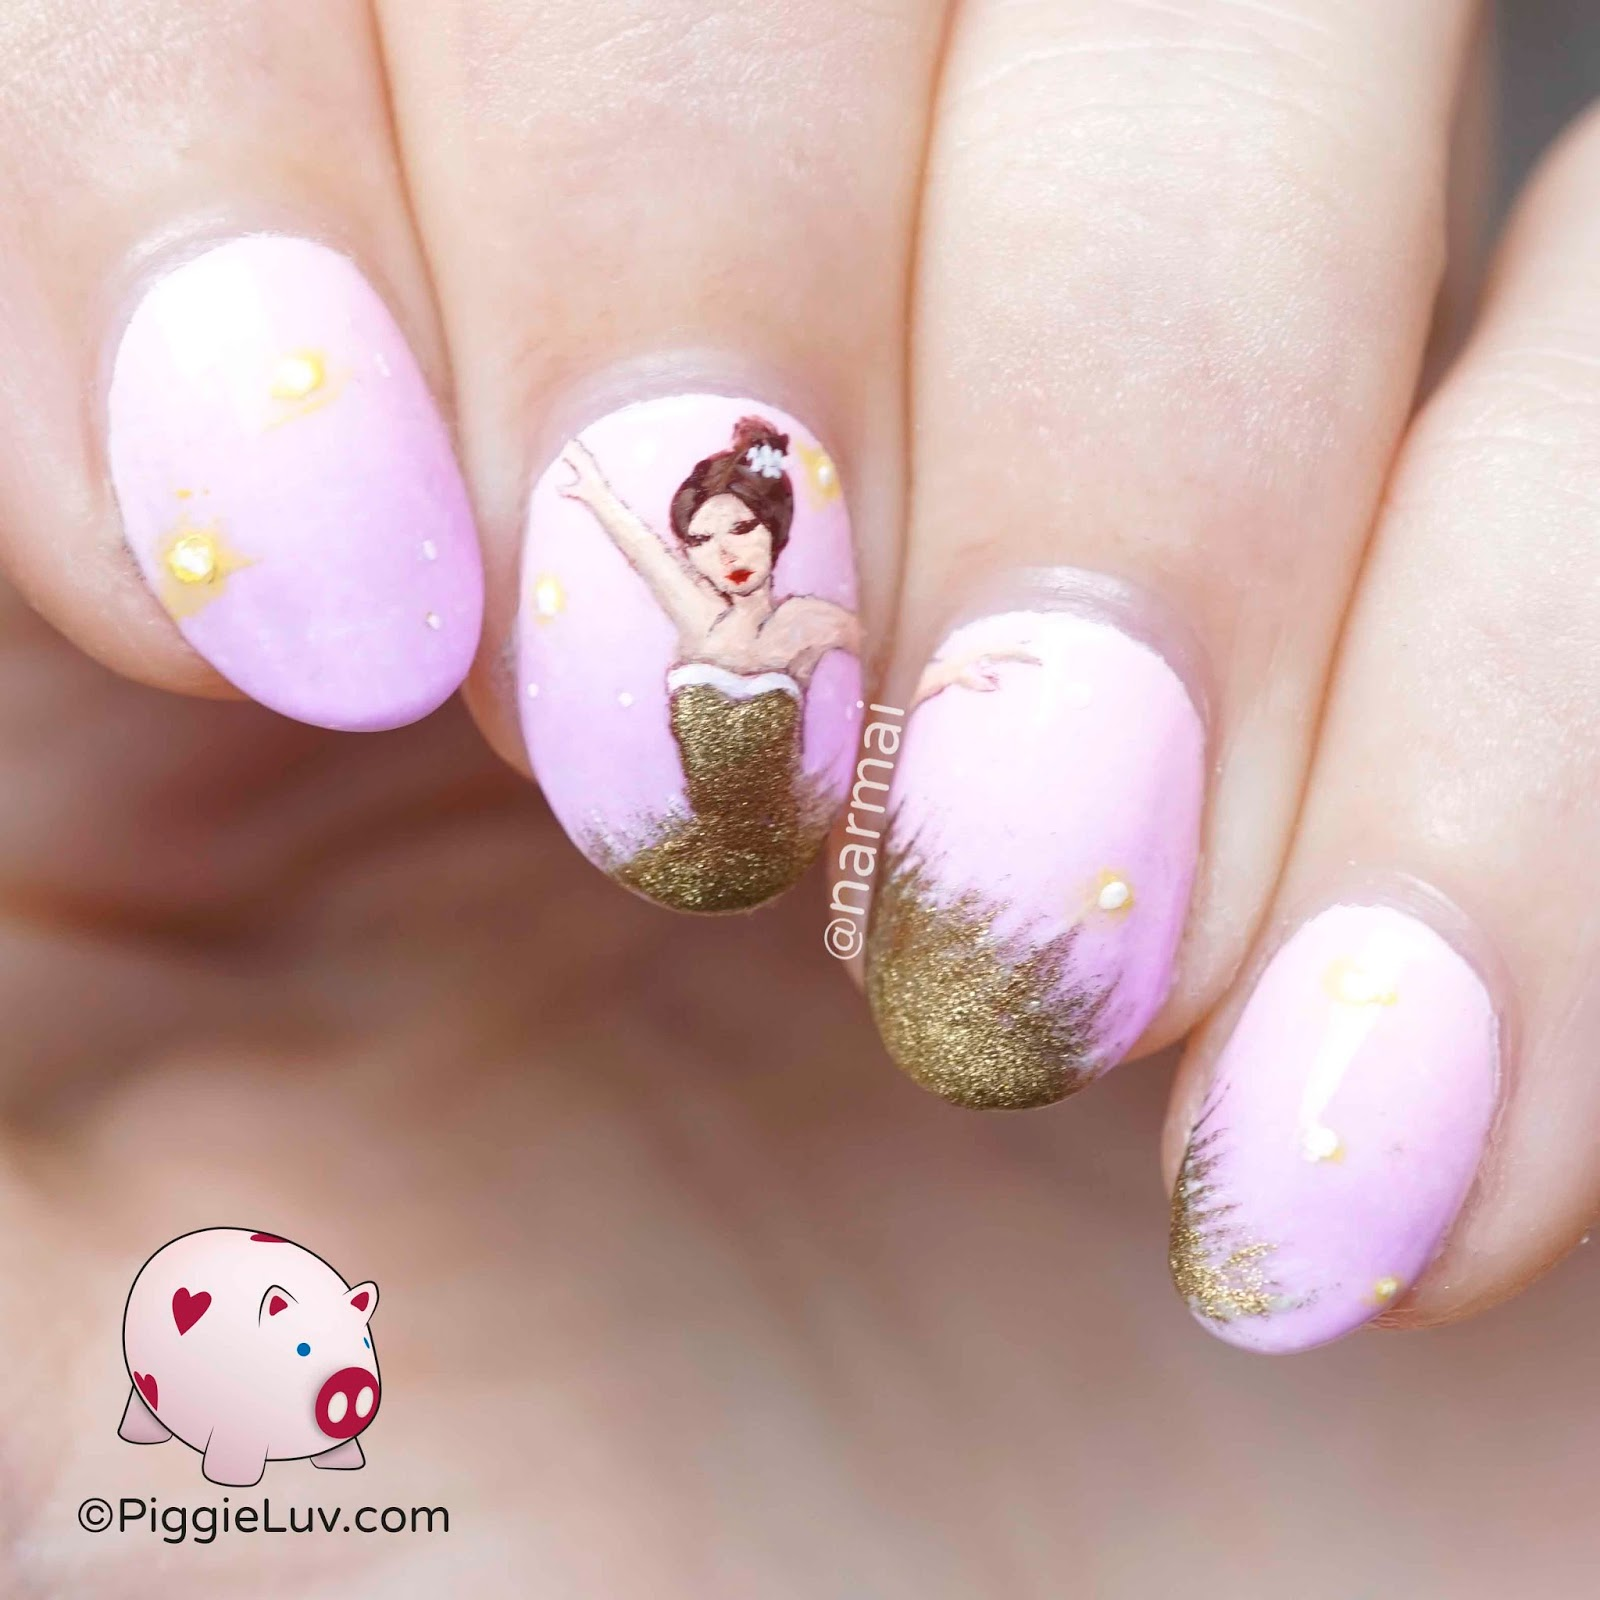 PiggieLuv: Glamour ballerina nail art